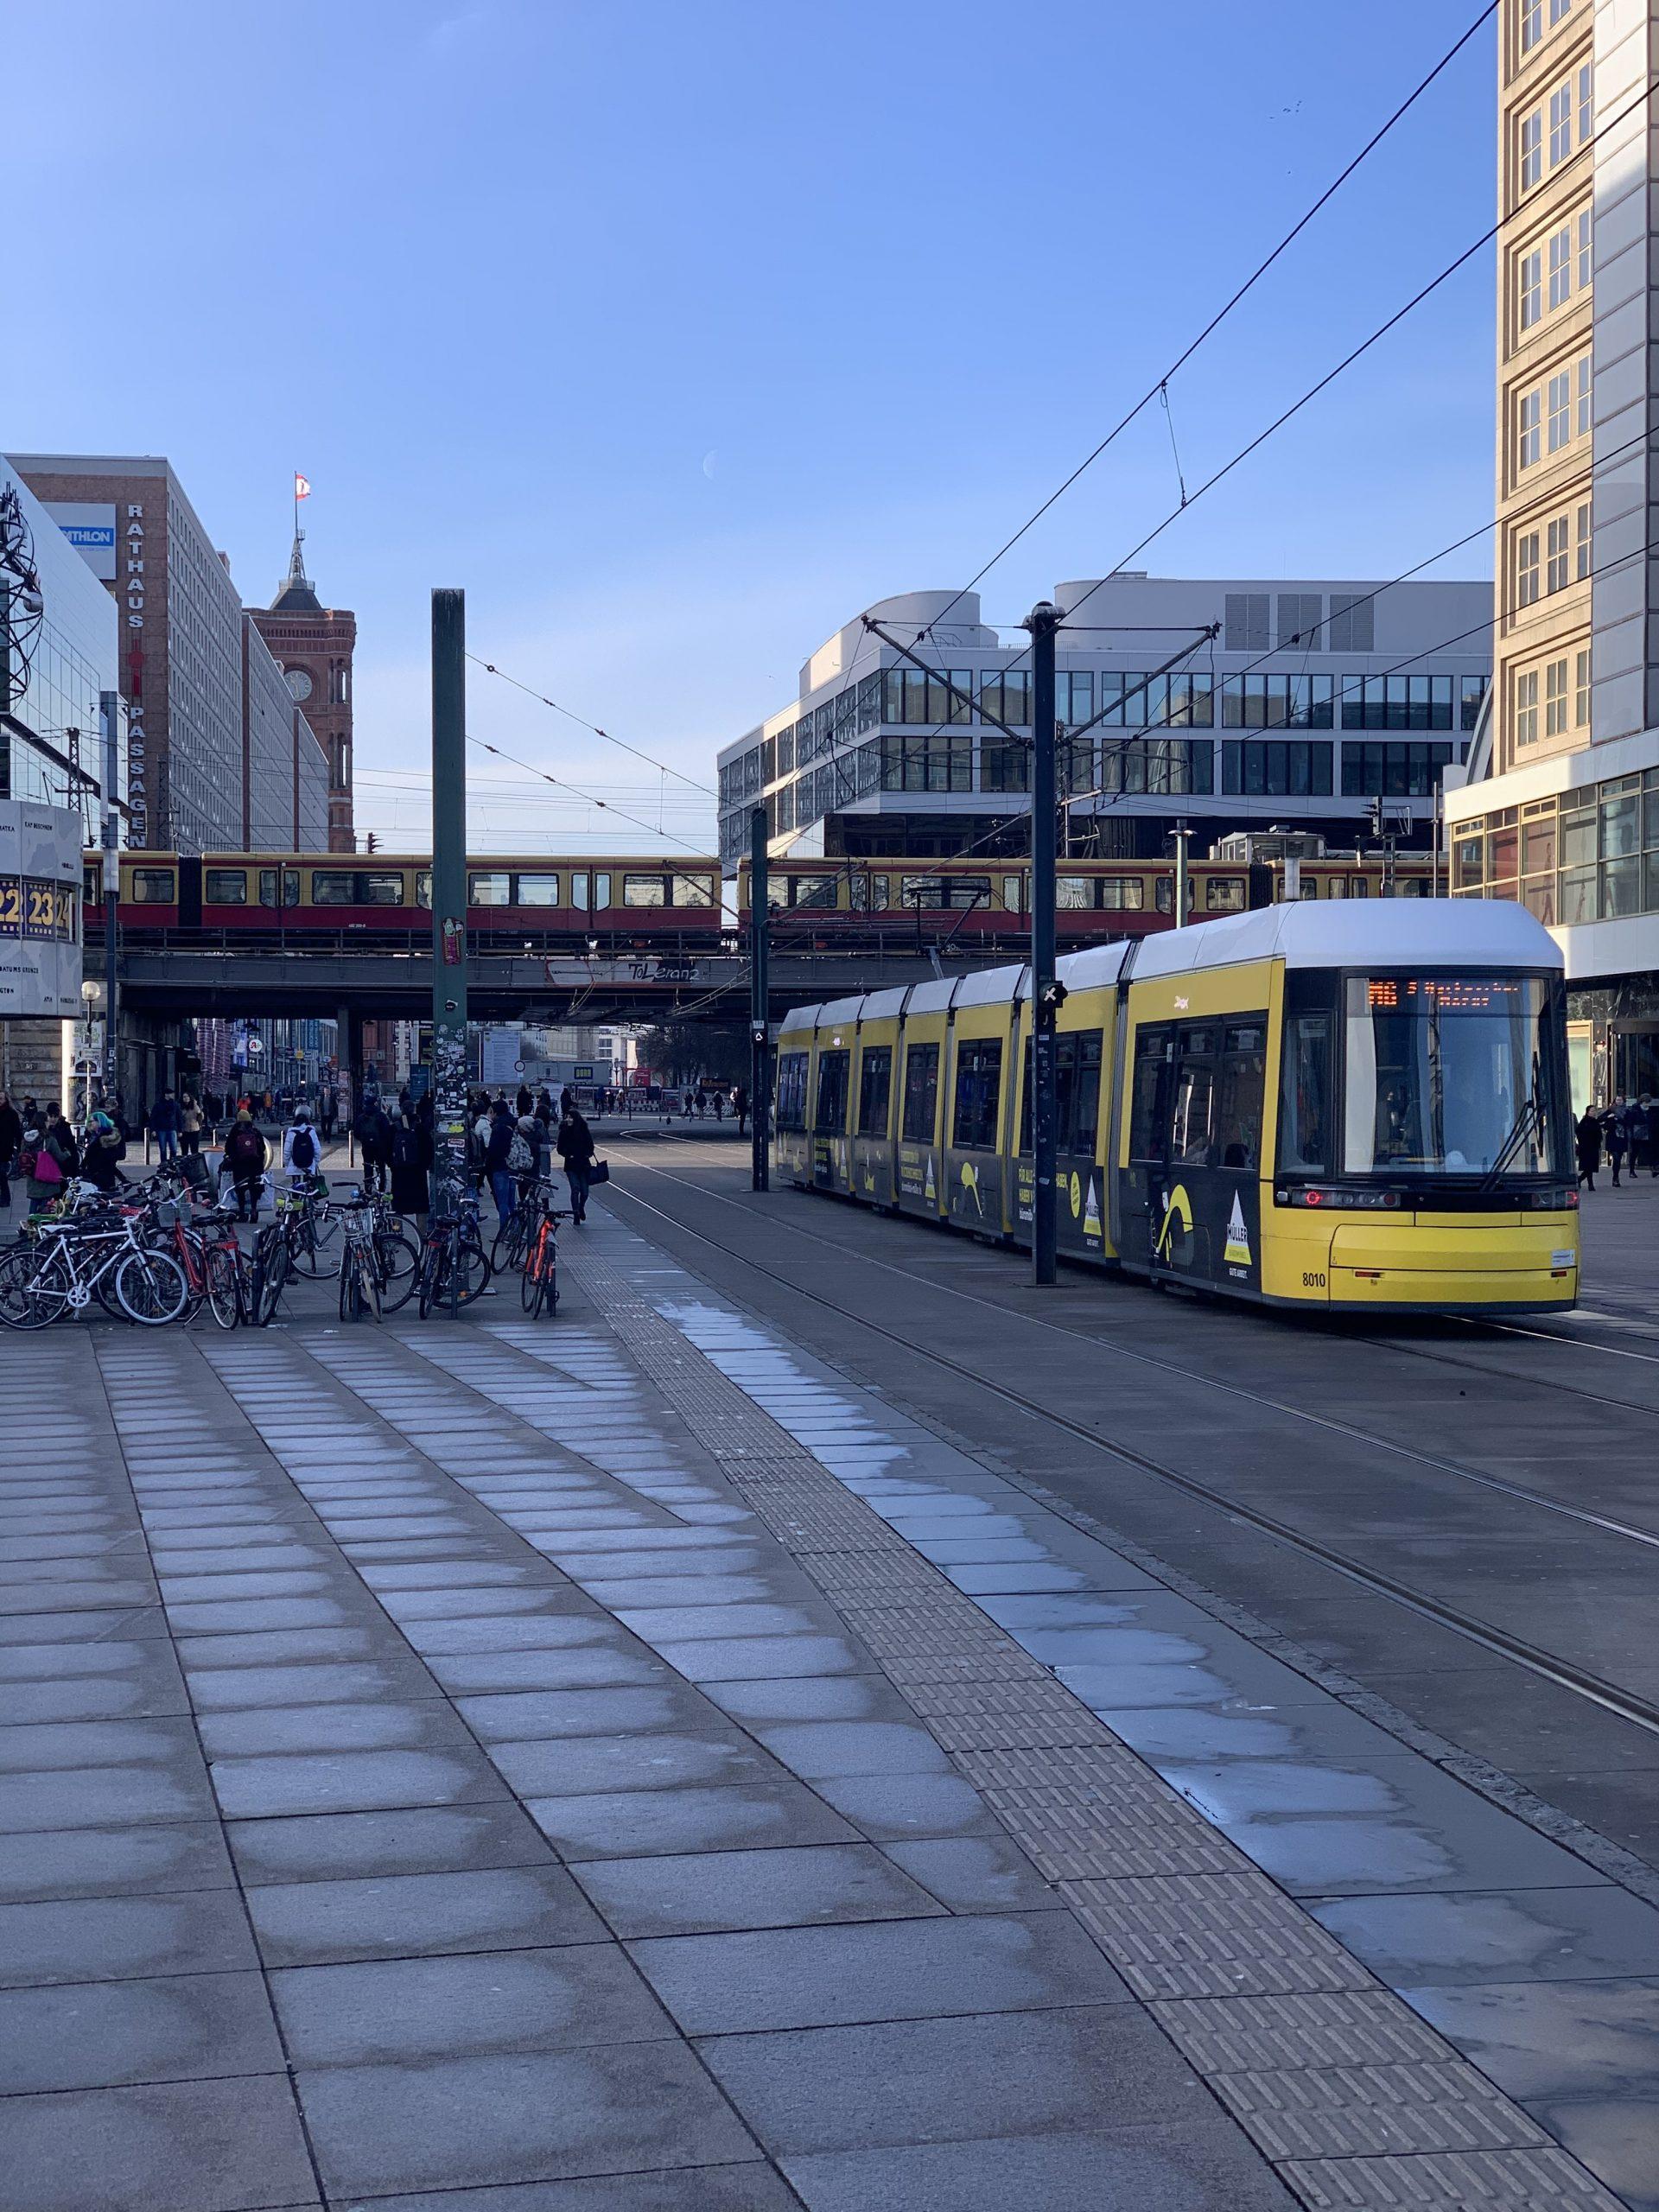 Berlin Tram et S-Bahn